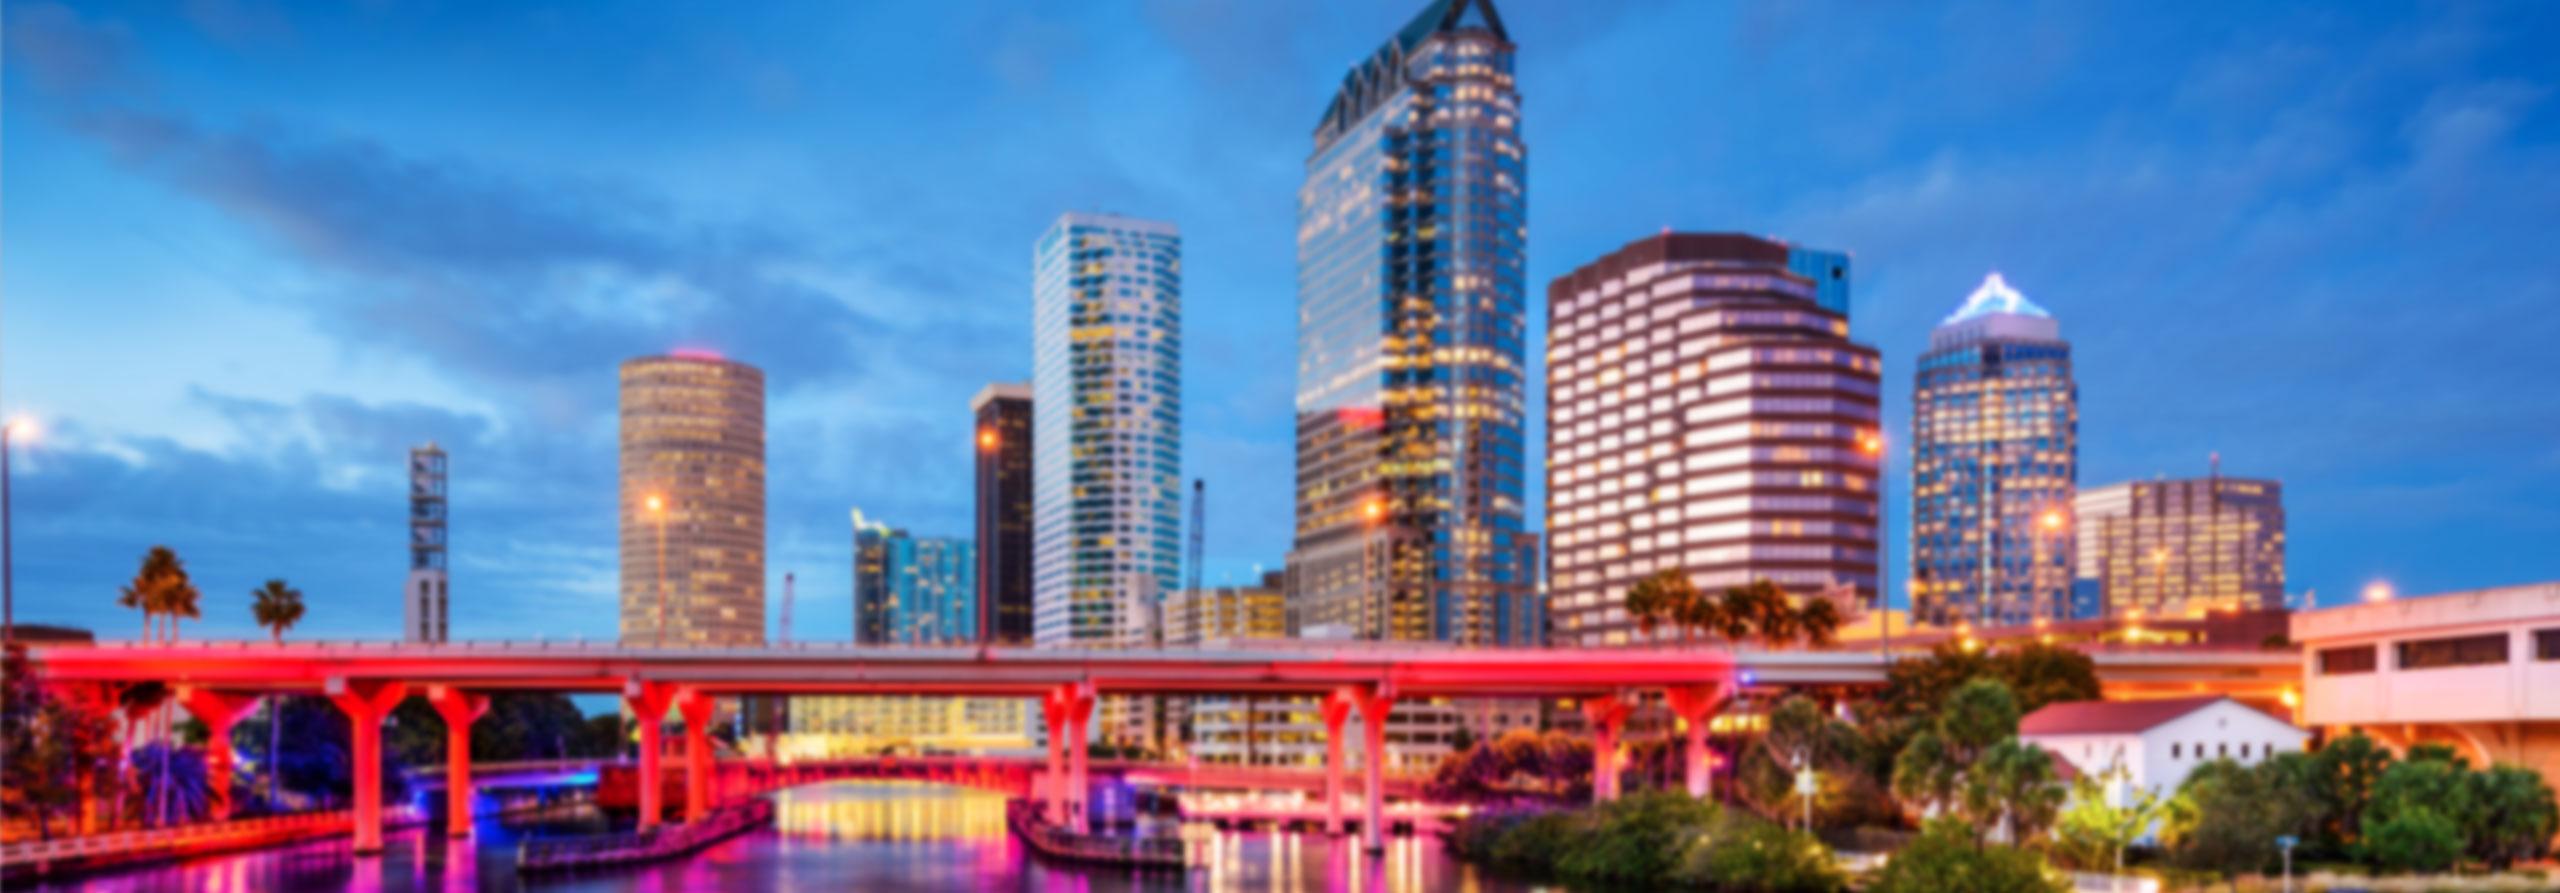 Florida Criminal Defense Attorney | Tampa Criminal Lawyer